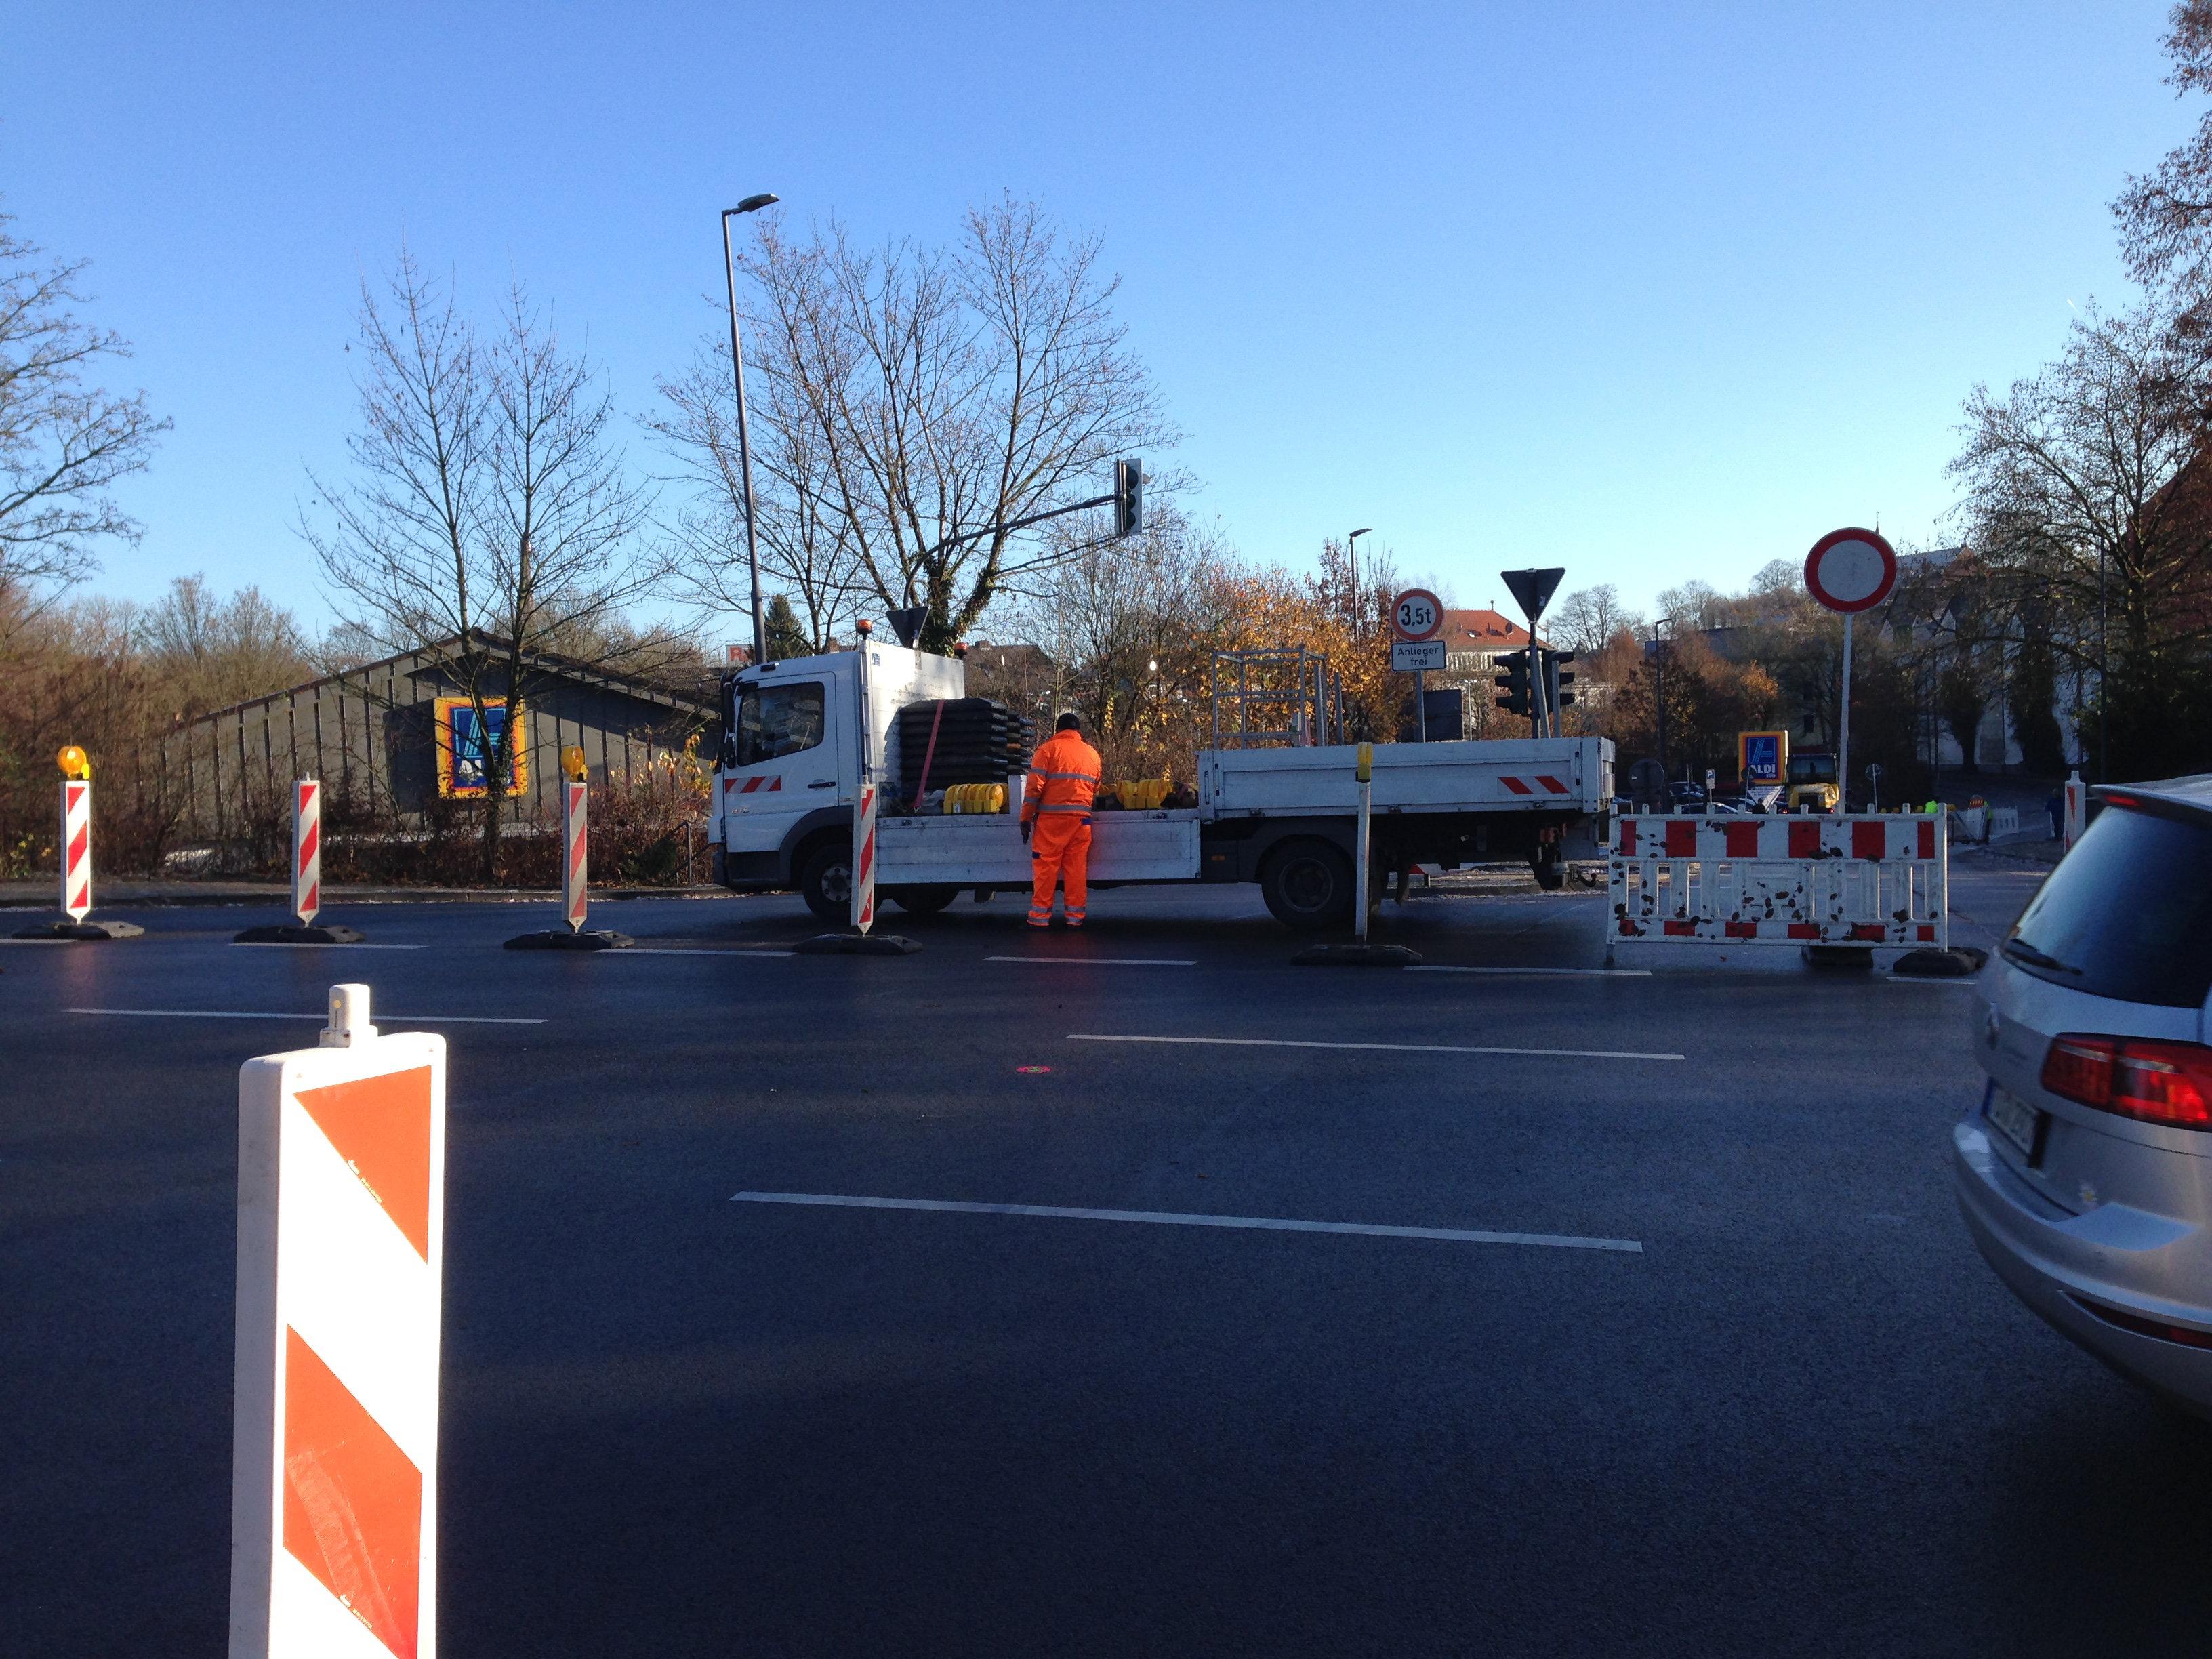 Baustelle am neuem Kreisverkehr an der Lenneper Straße